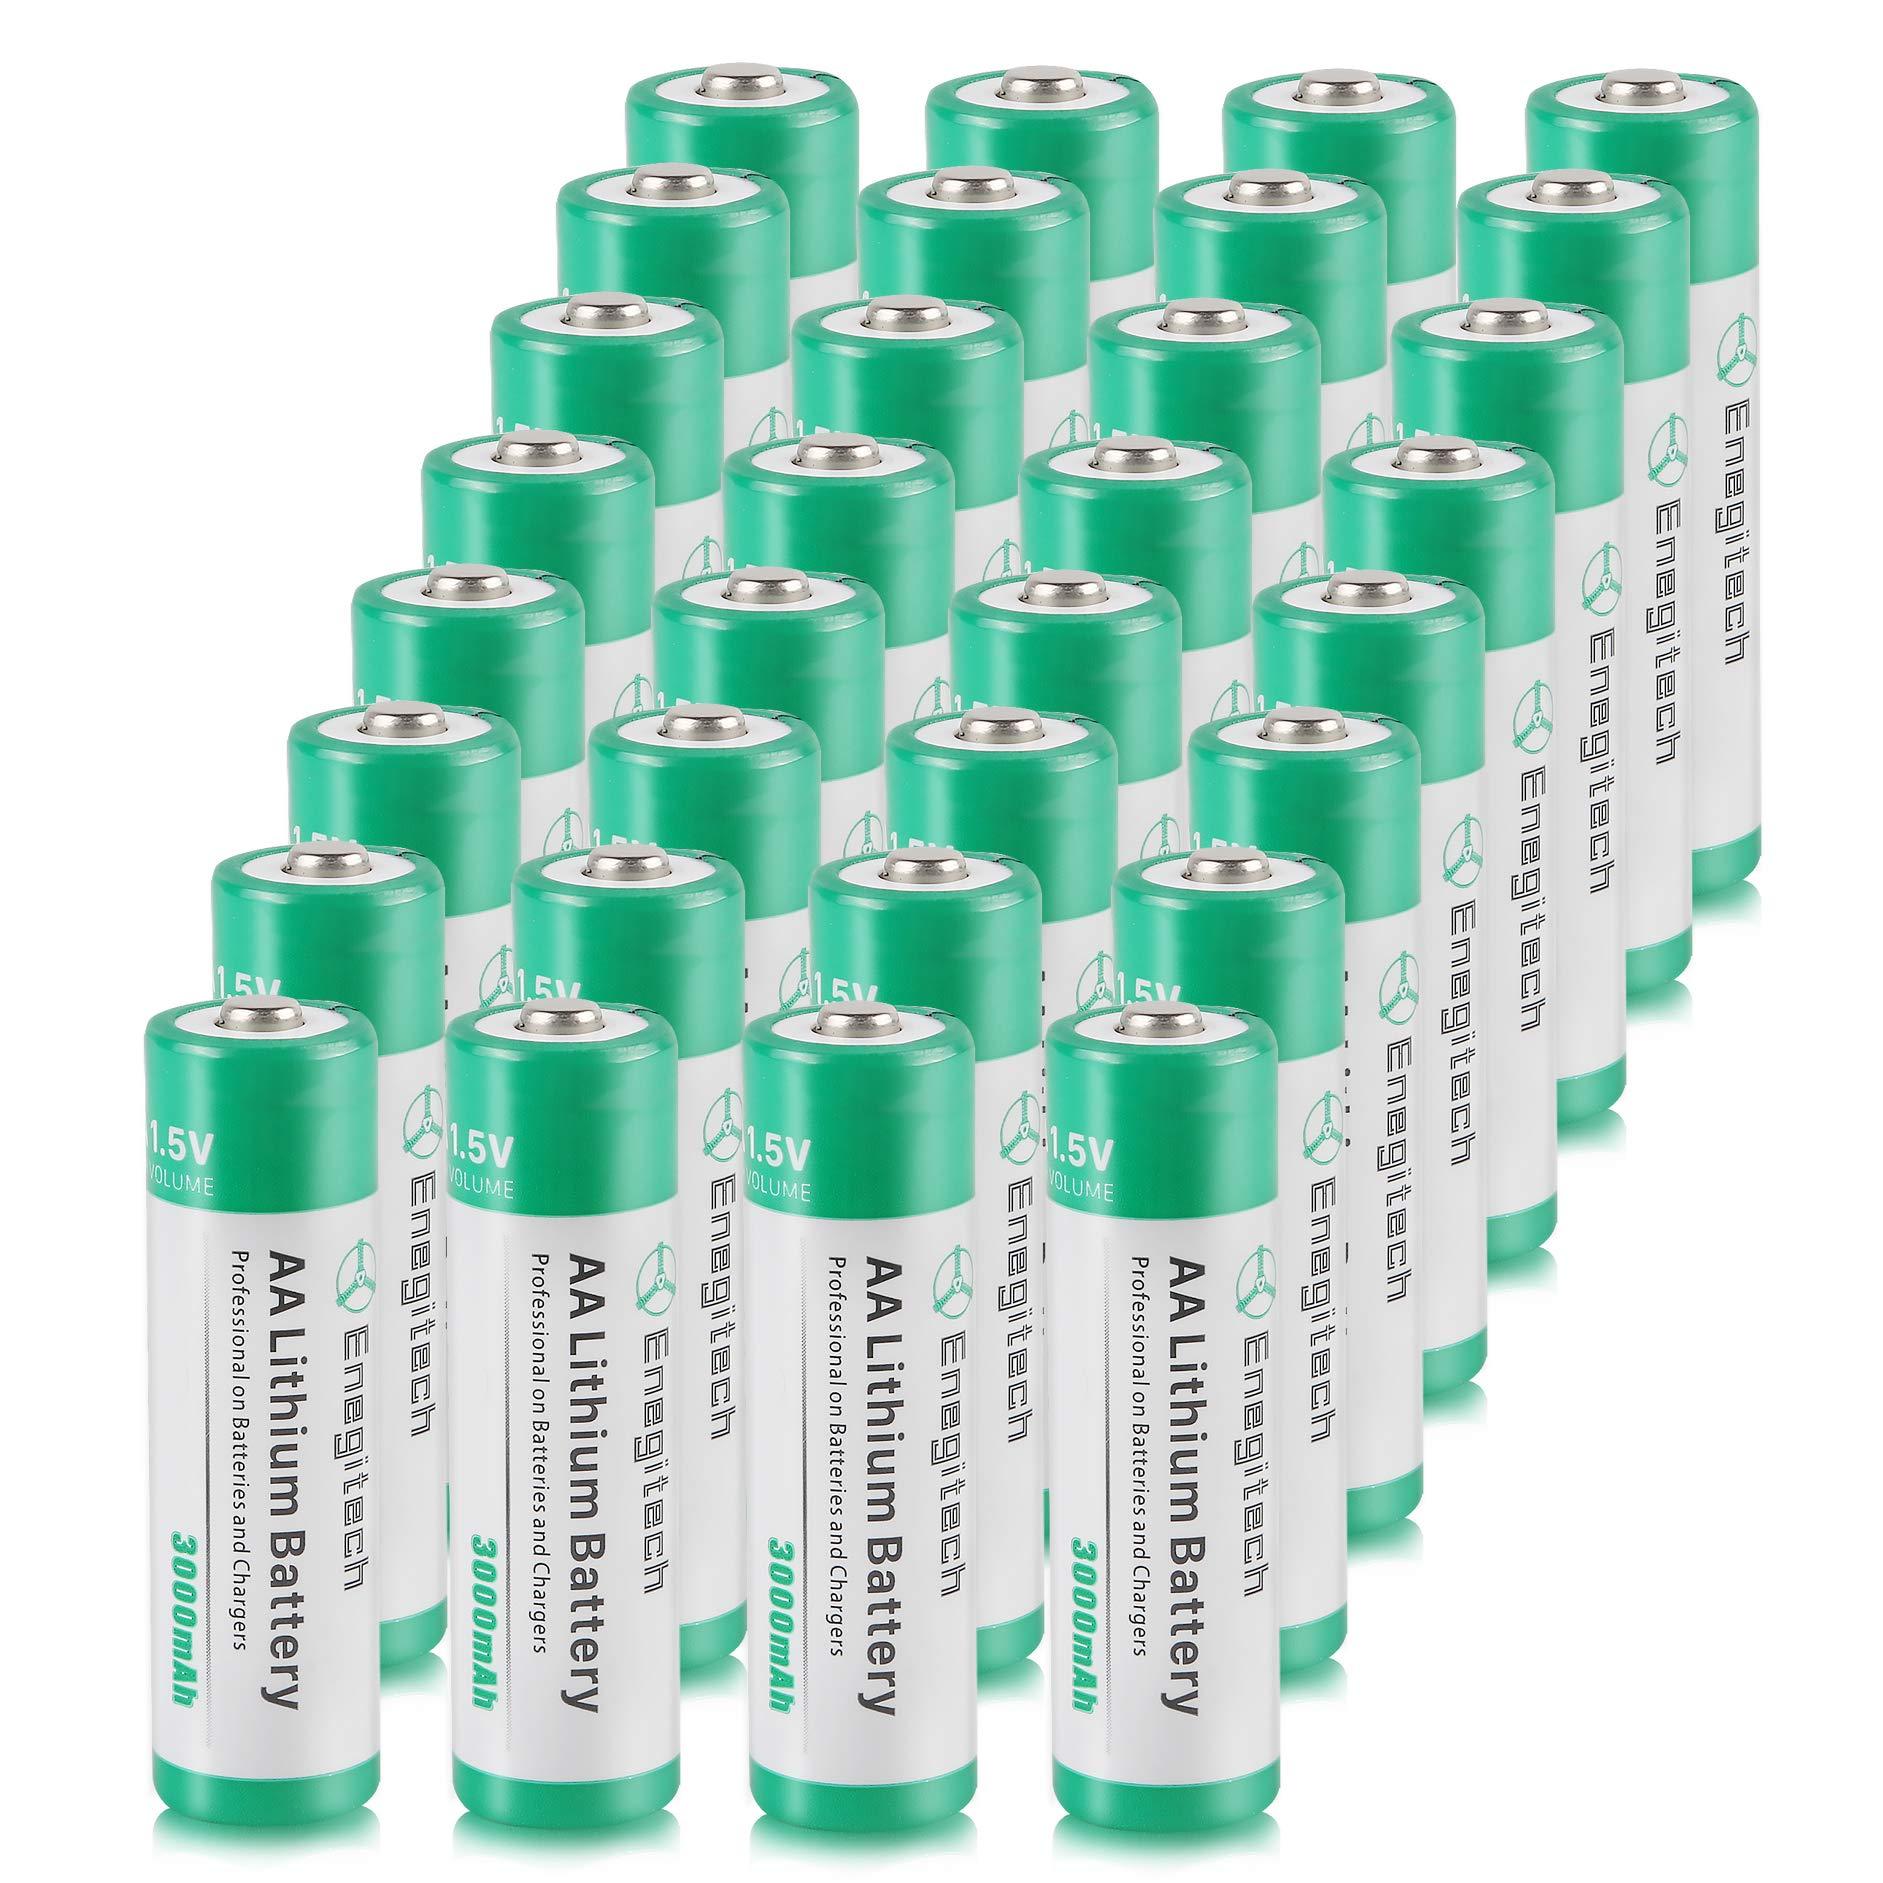 AA Lithium Battery 32 Pack, Enegitech 3000mAh 1.5V Double A Long-lasing Li Ion Battery Non-Rechargeable Flashlight Solar Lights Remote Control by Enegitech